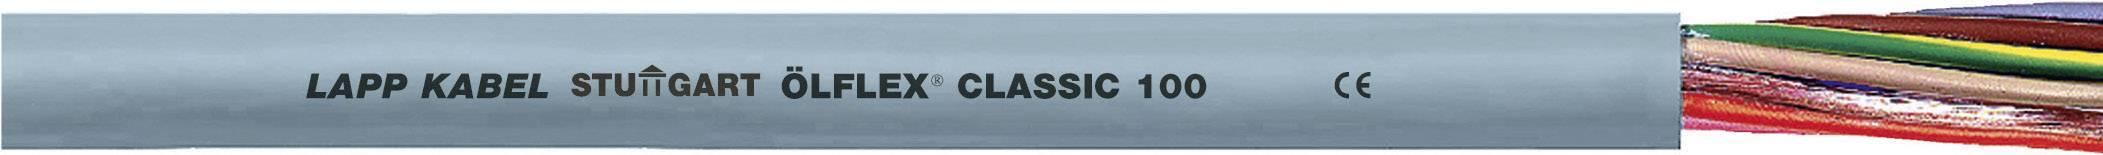 Kabel LappKabel Ölflex CLASSIC 100 5G95 (00103153), PVC, 51,6 mm, 750 V, šedá, 100 m